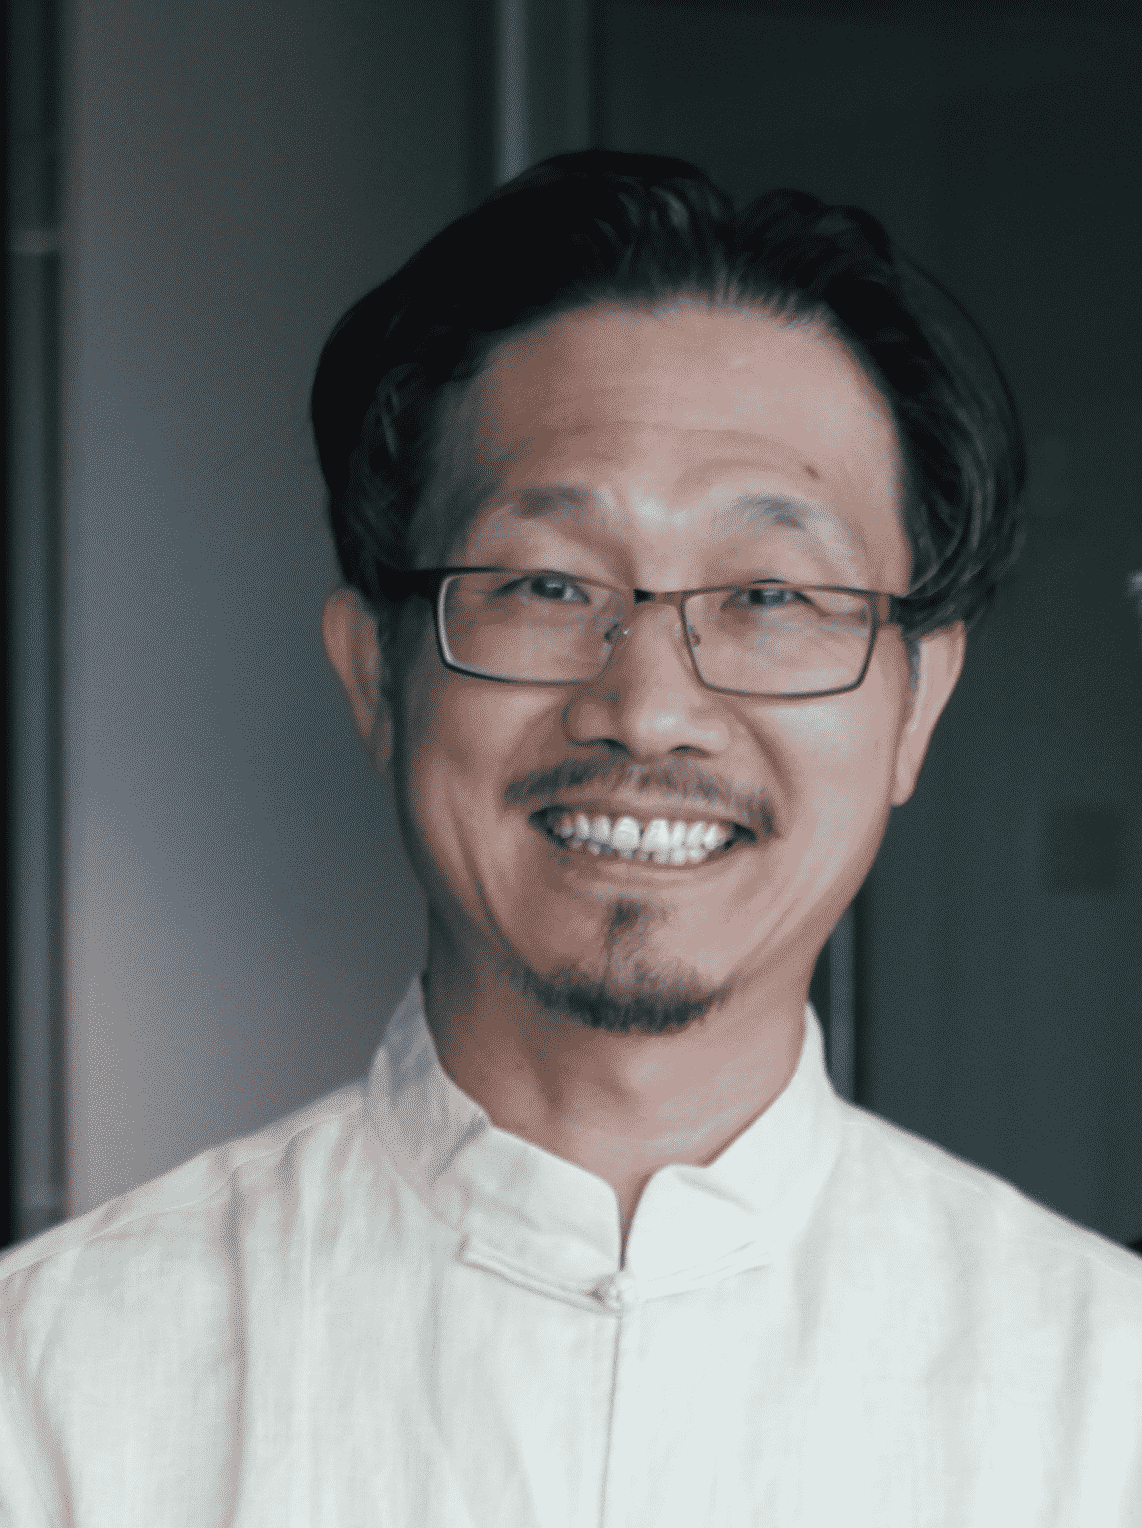 feng shui consultant feng shui master edgar lok tin yung chi yung office feng